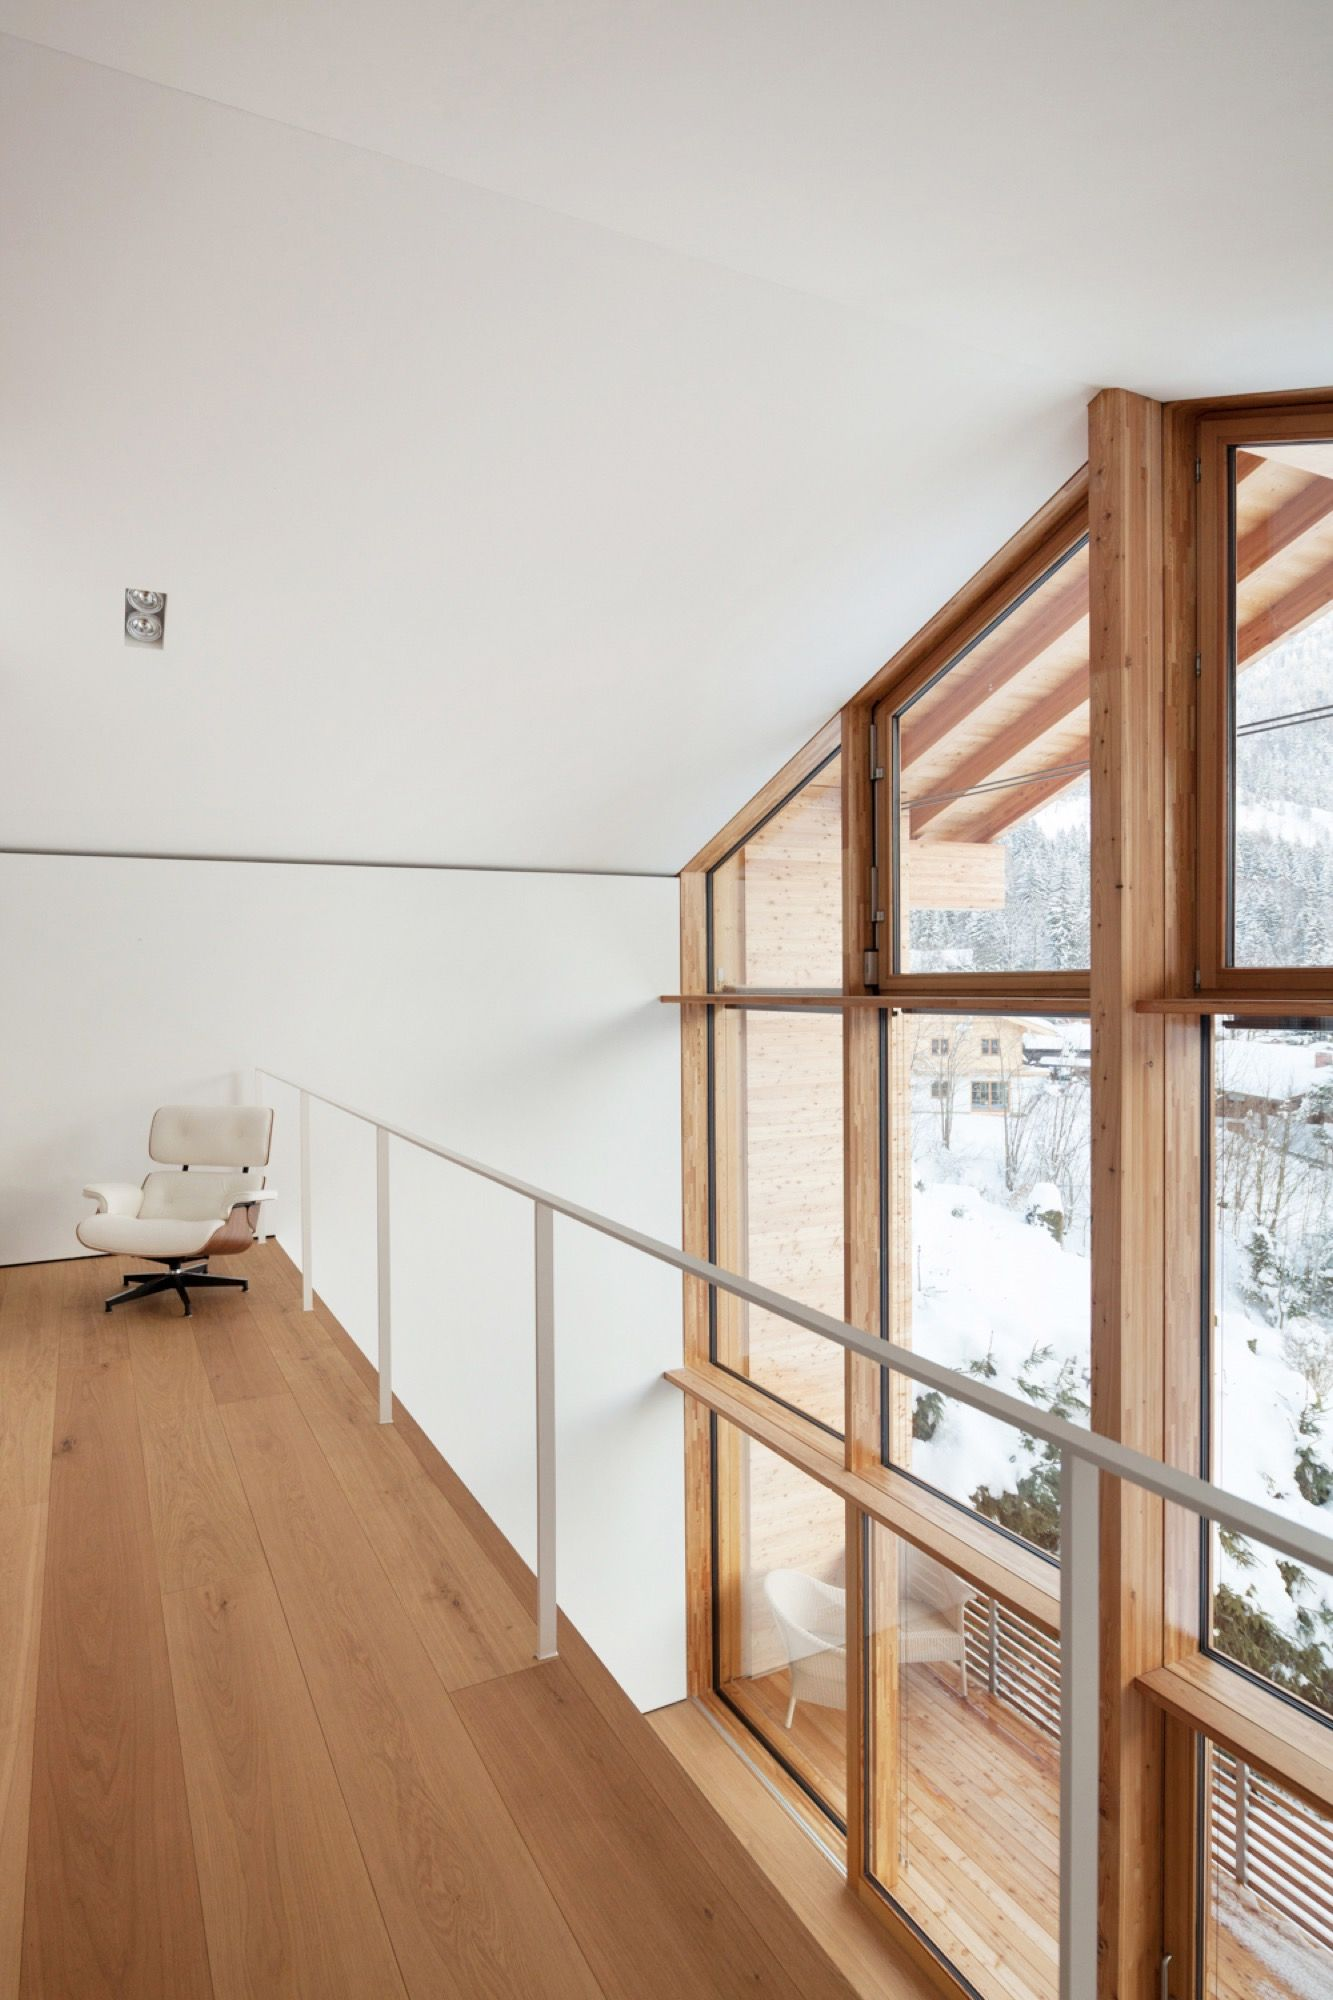 Haus Z2 in Bayrischzell | Haus, Window and Room